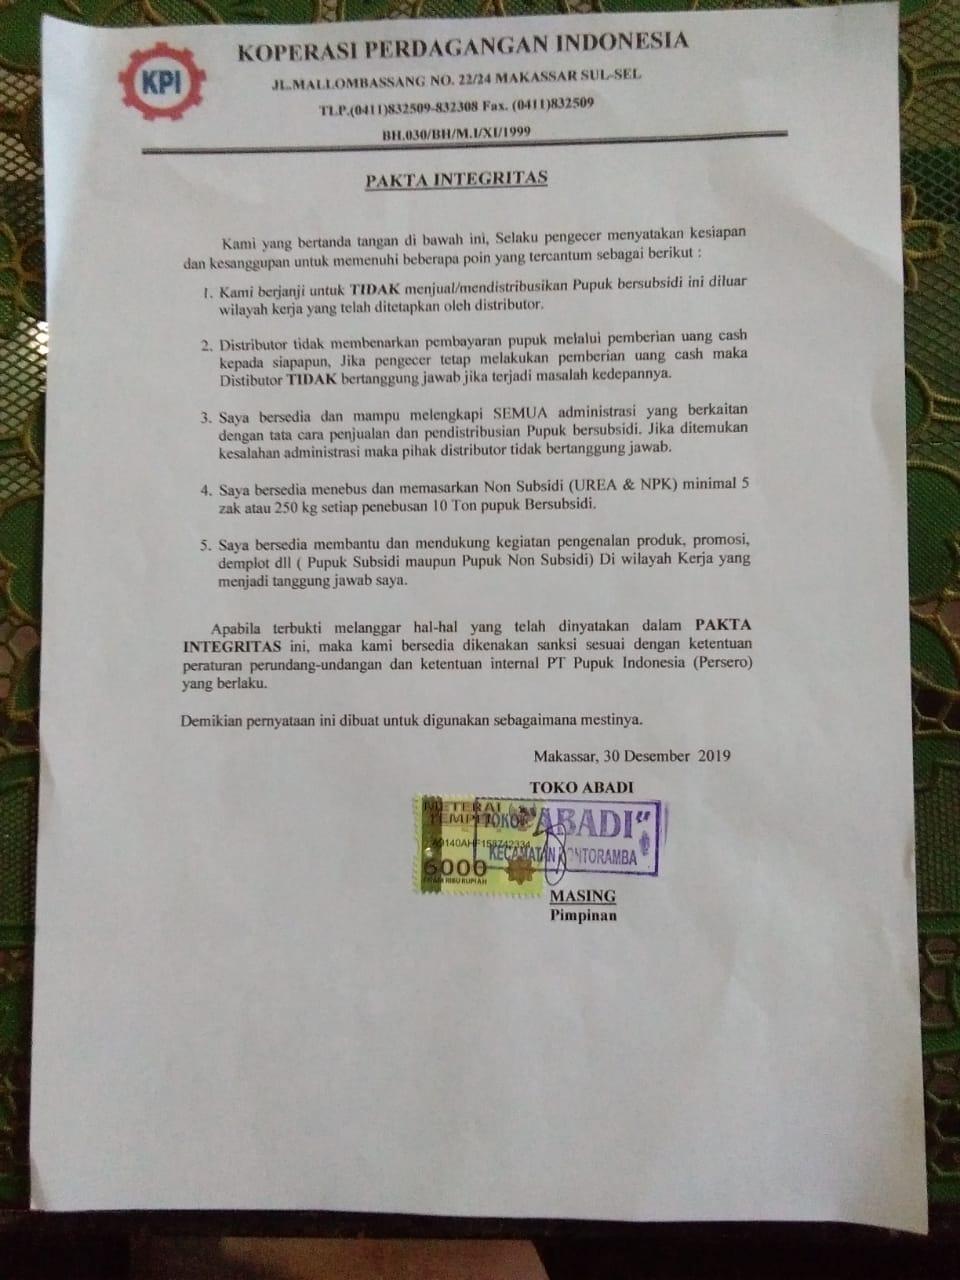 Melanggar Fakta Integritas, Koperasi Perdagangan Indonesia Cabut Satu Pengecer Pupuk di kecamatan Bontoramba